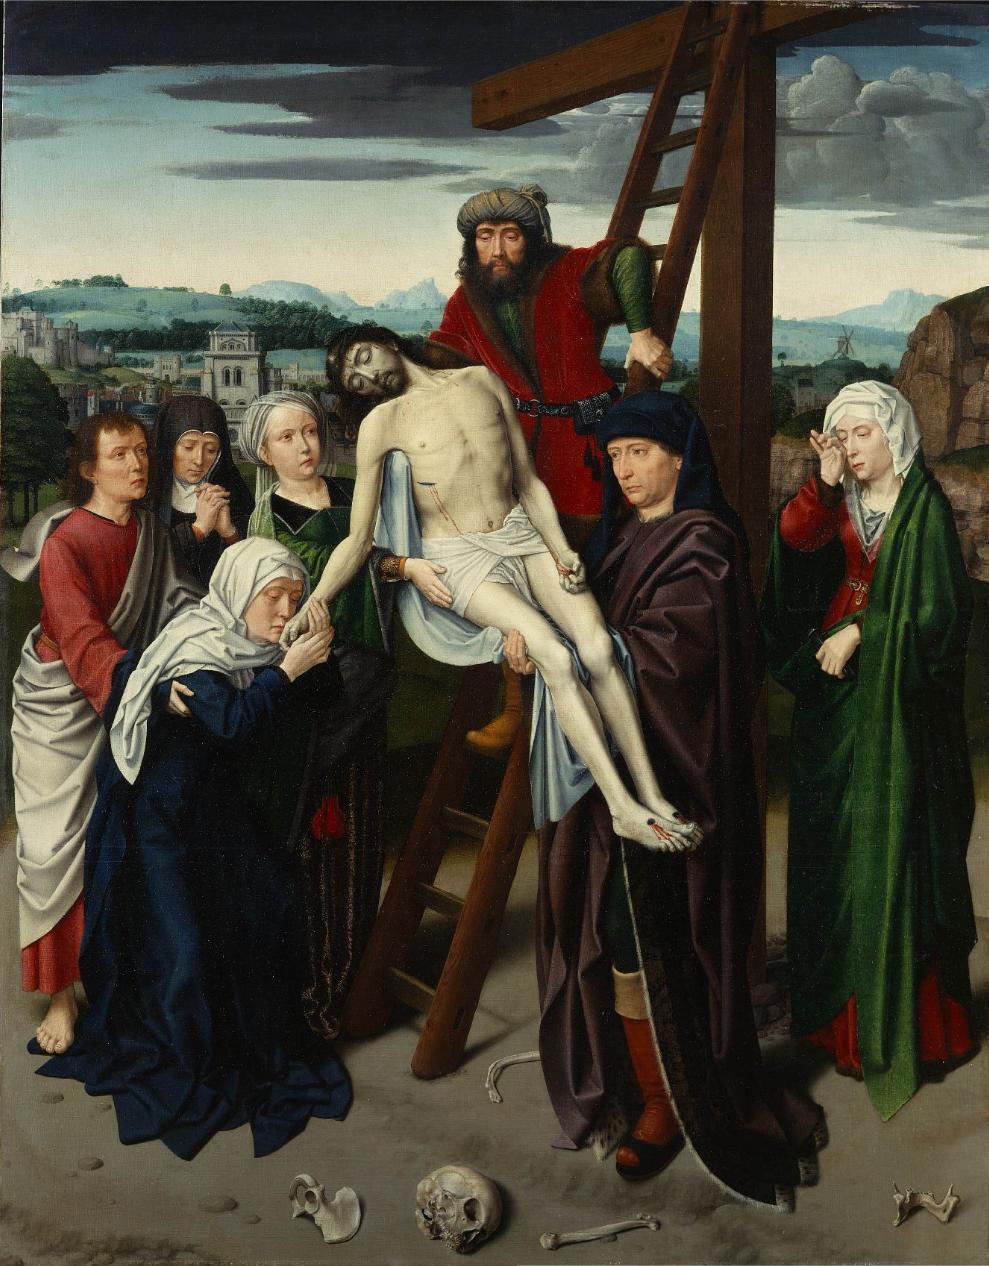 Gerard_David_-_Deposition 1495-1500 Frick Collection New York